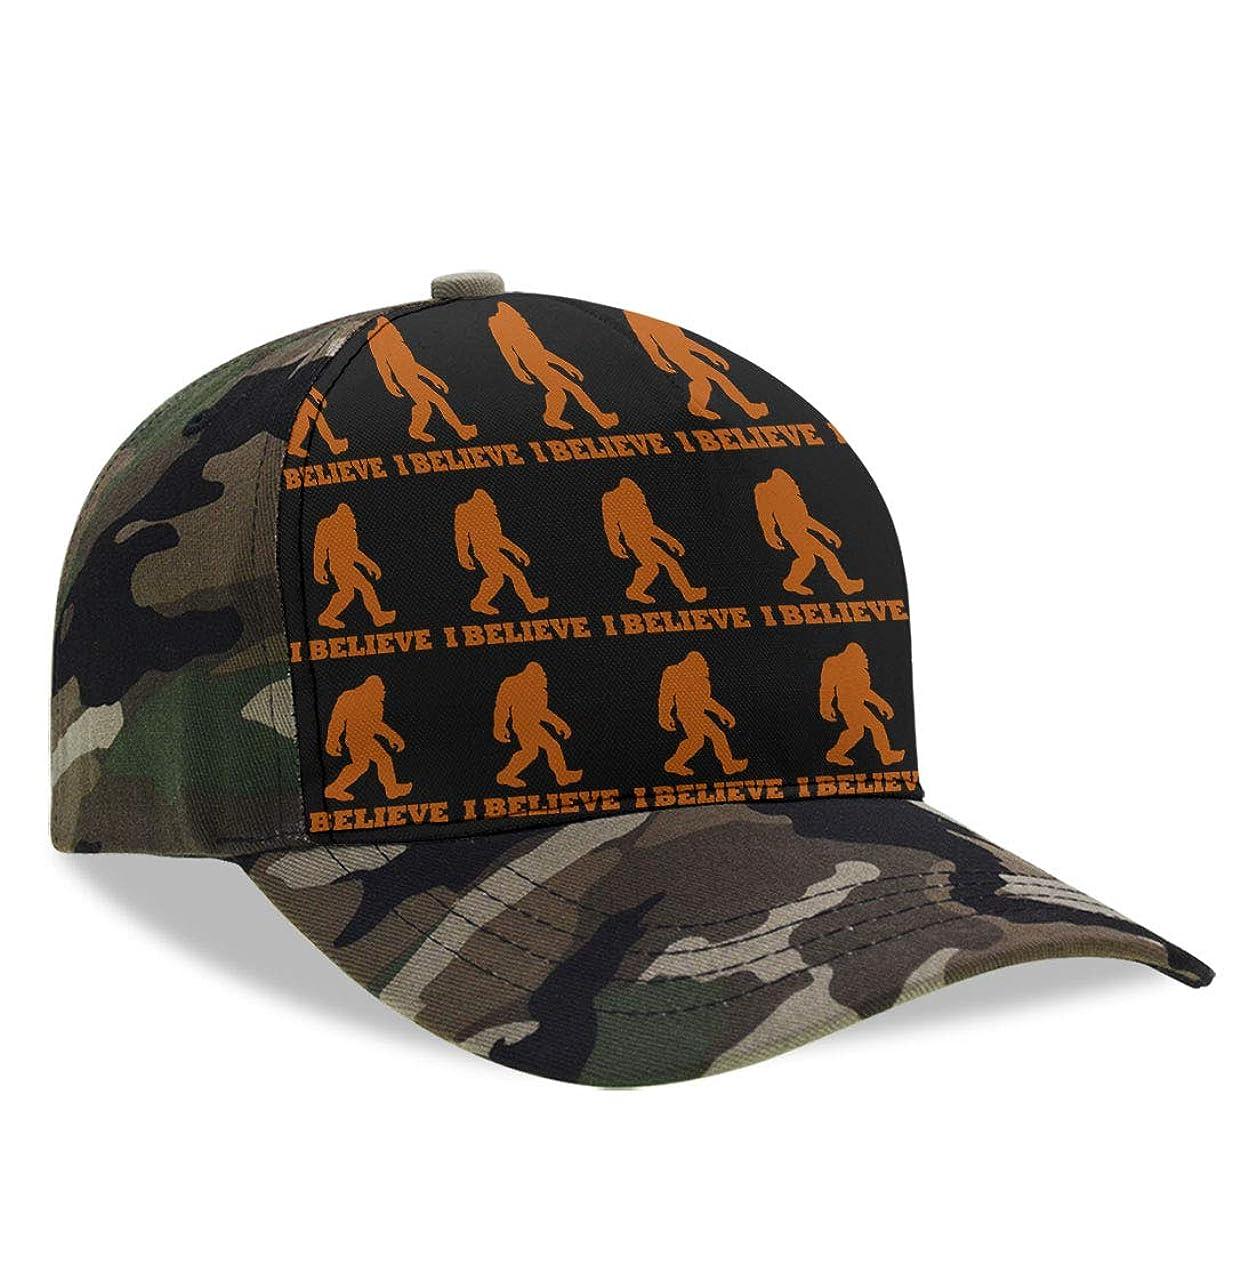 YongColer Men & Women Baseball Cap Hip Pop Trucker Cap Snapback Hat Dad Cap